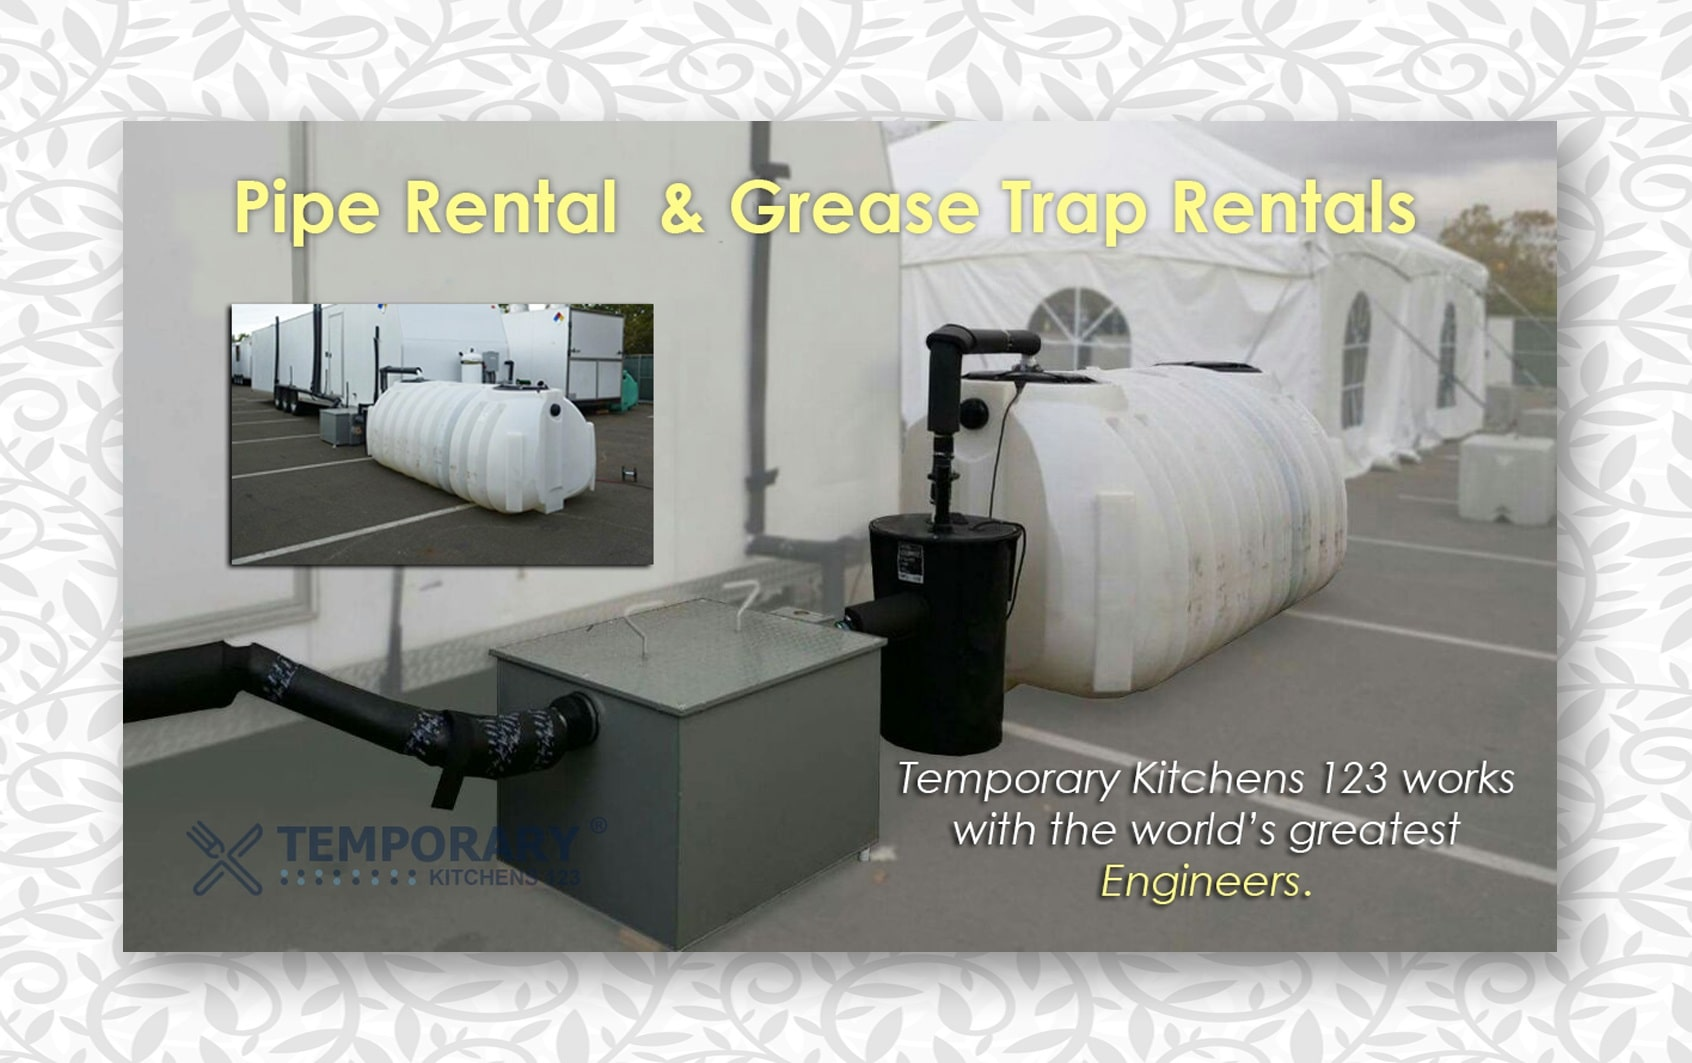 Pipe Rental & Grease Trap Rentals